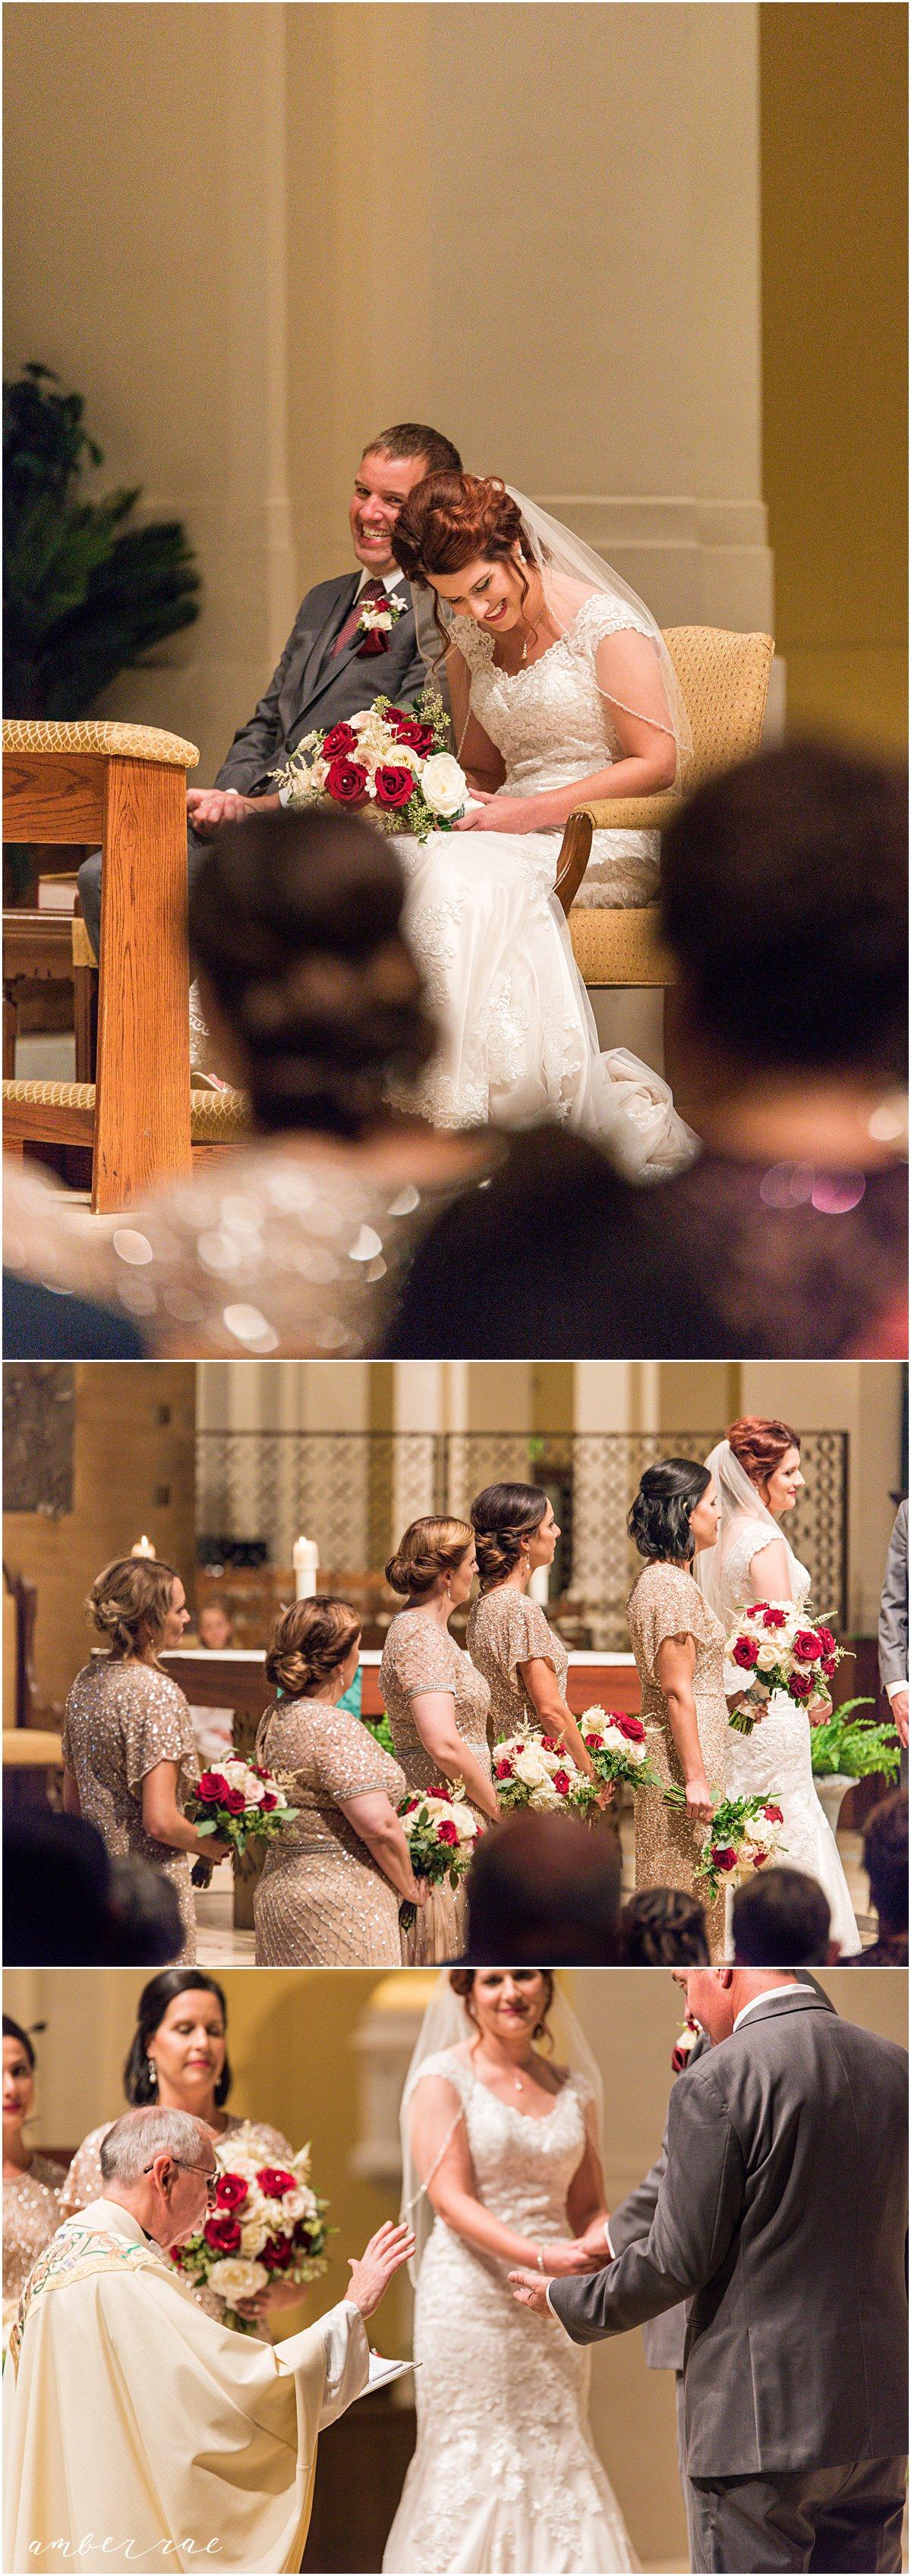 Gustafson Wedding 2018_0017.jpg